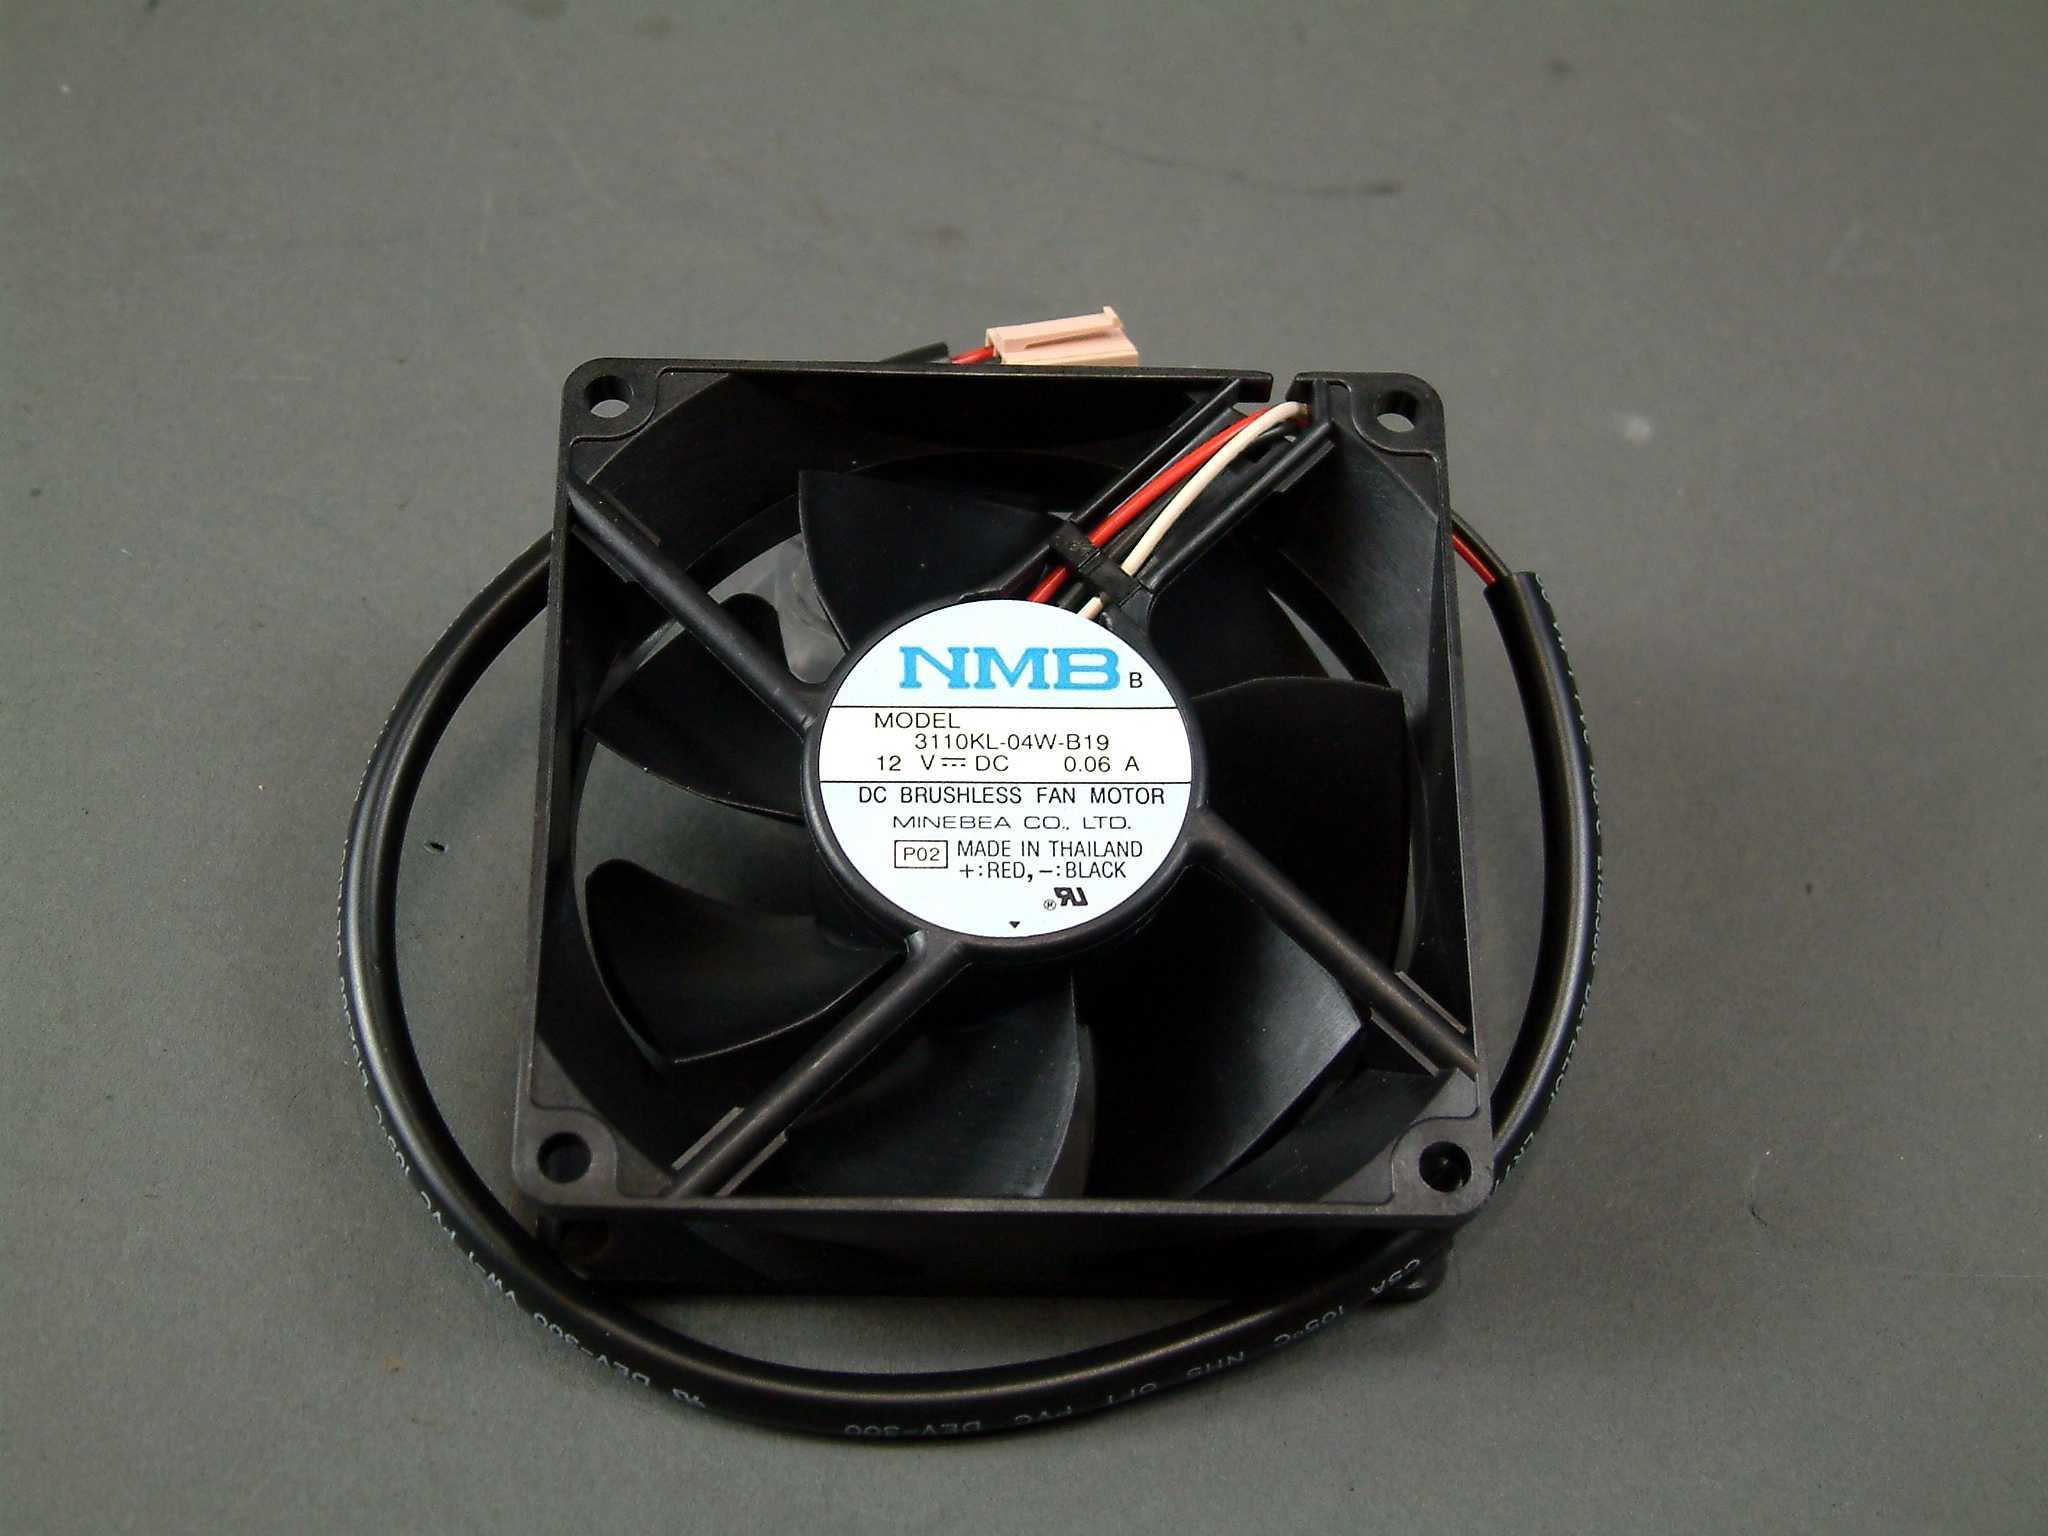 12V fan for NMB 8025 Case Fan 12V 3110FB-04W-B76 dual ball bearing large air volume 4-pin fan 8cm server cooling fan